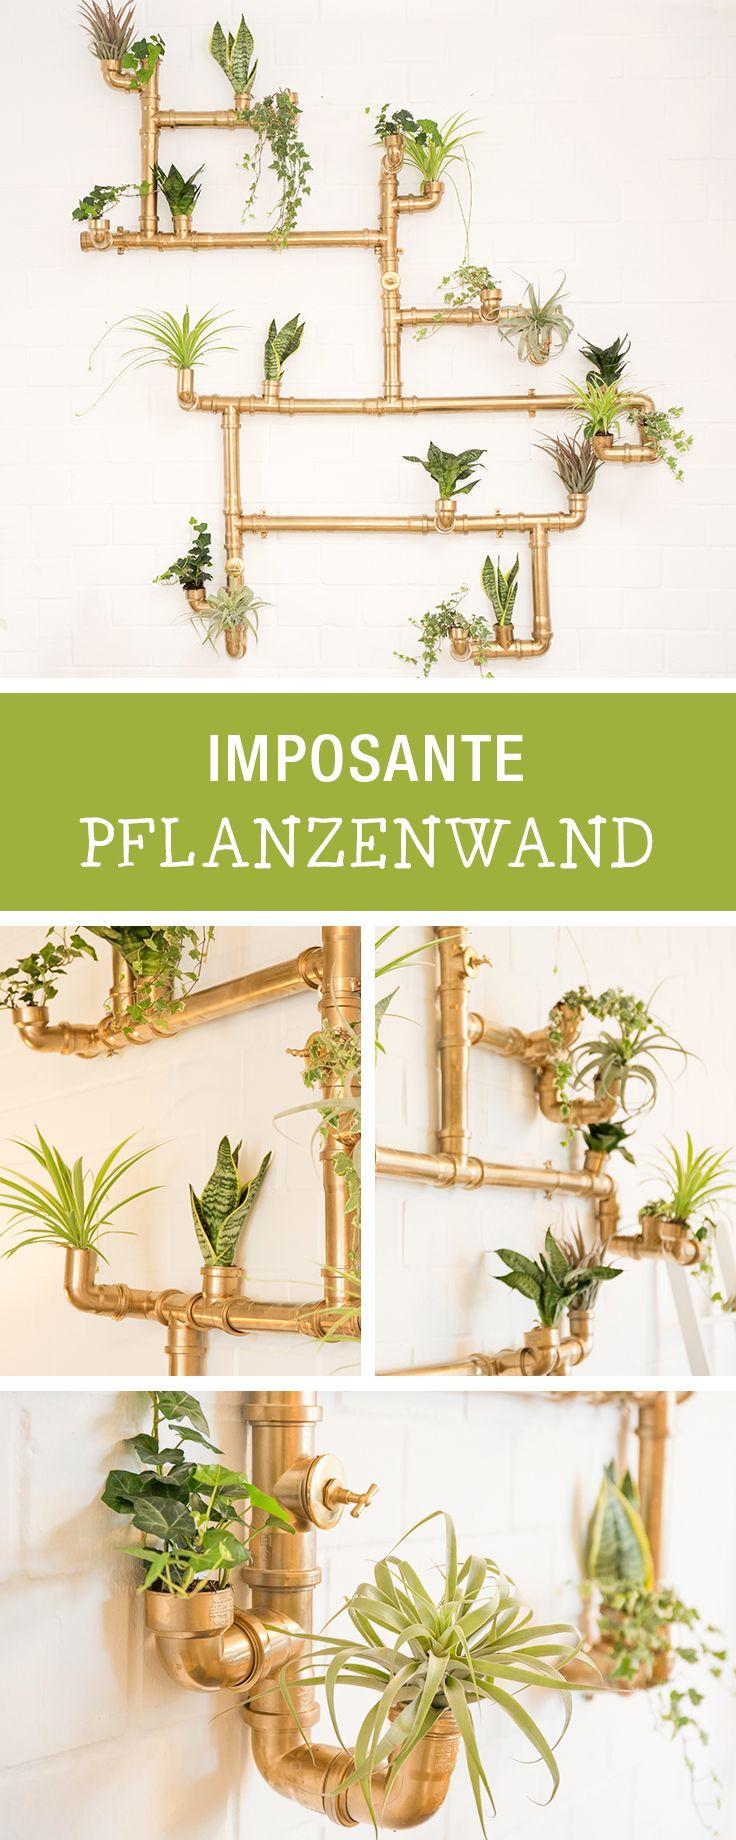 Pflanzenwand Bauen diy anleitung imposante pflanzenwand selber bauen via dawanda com